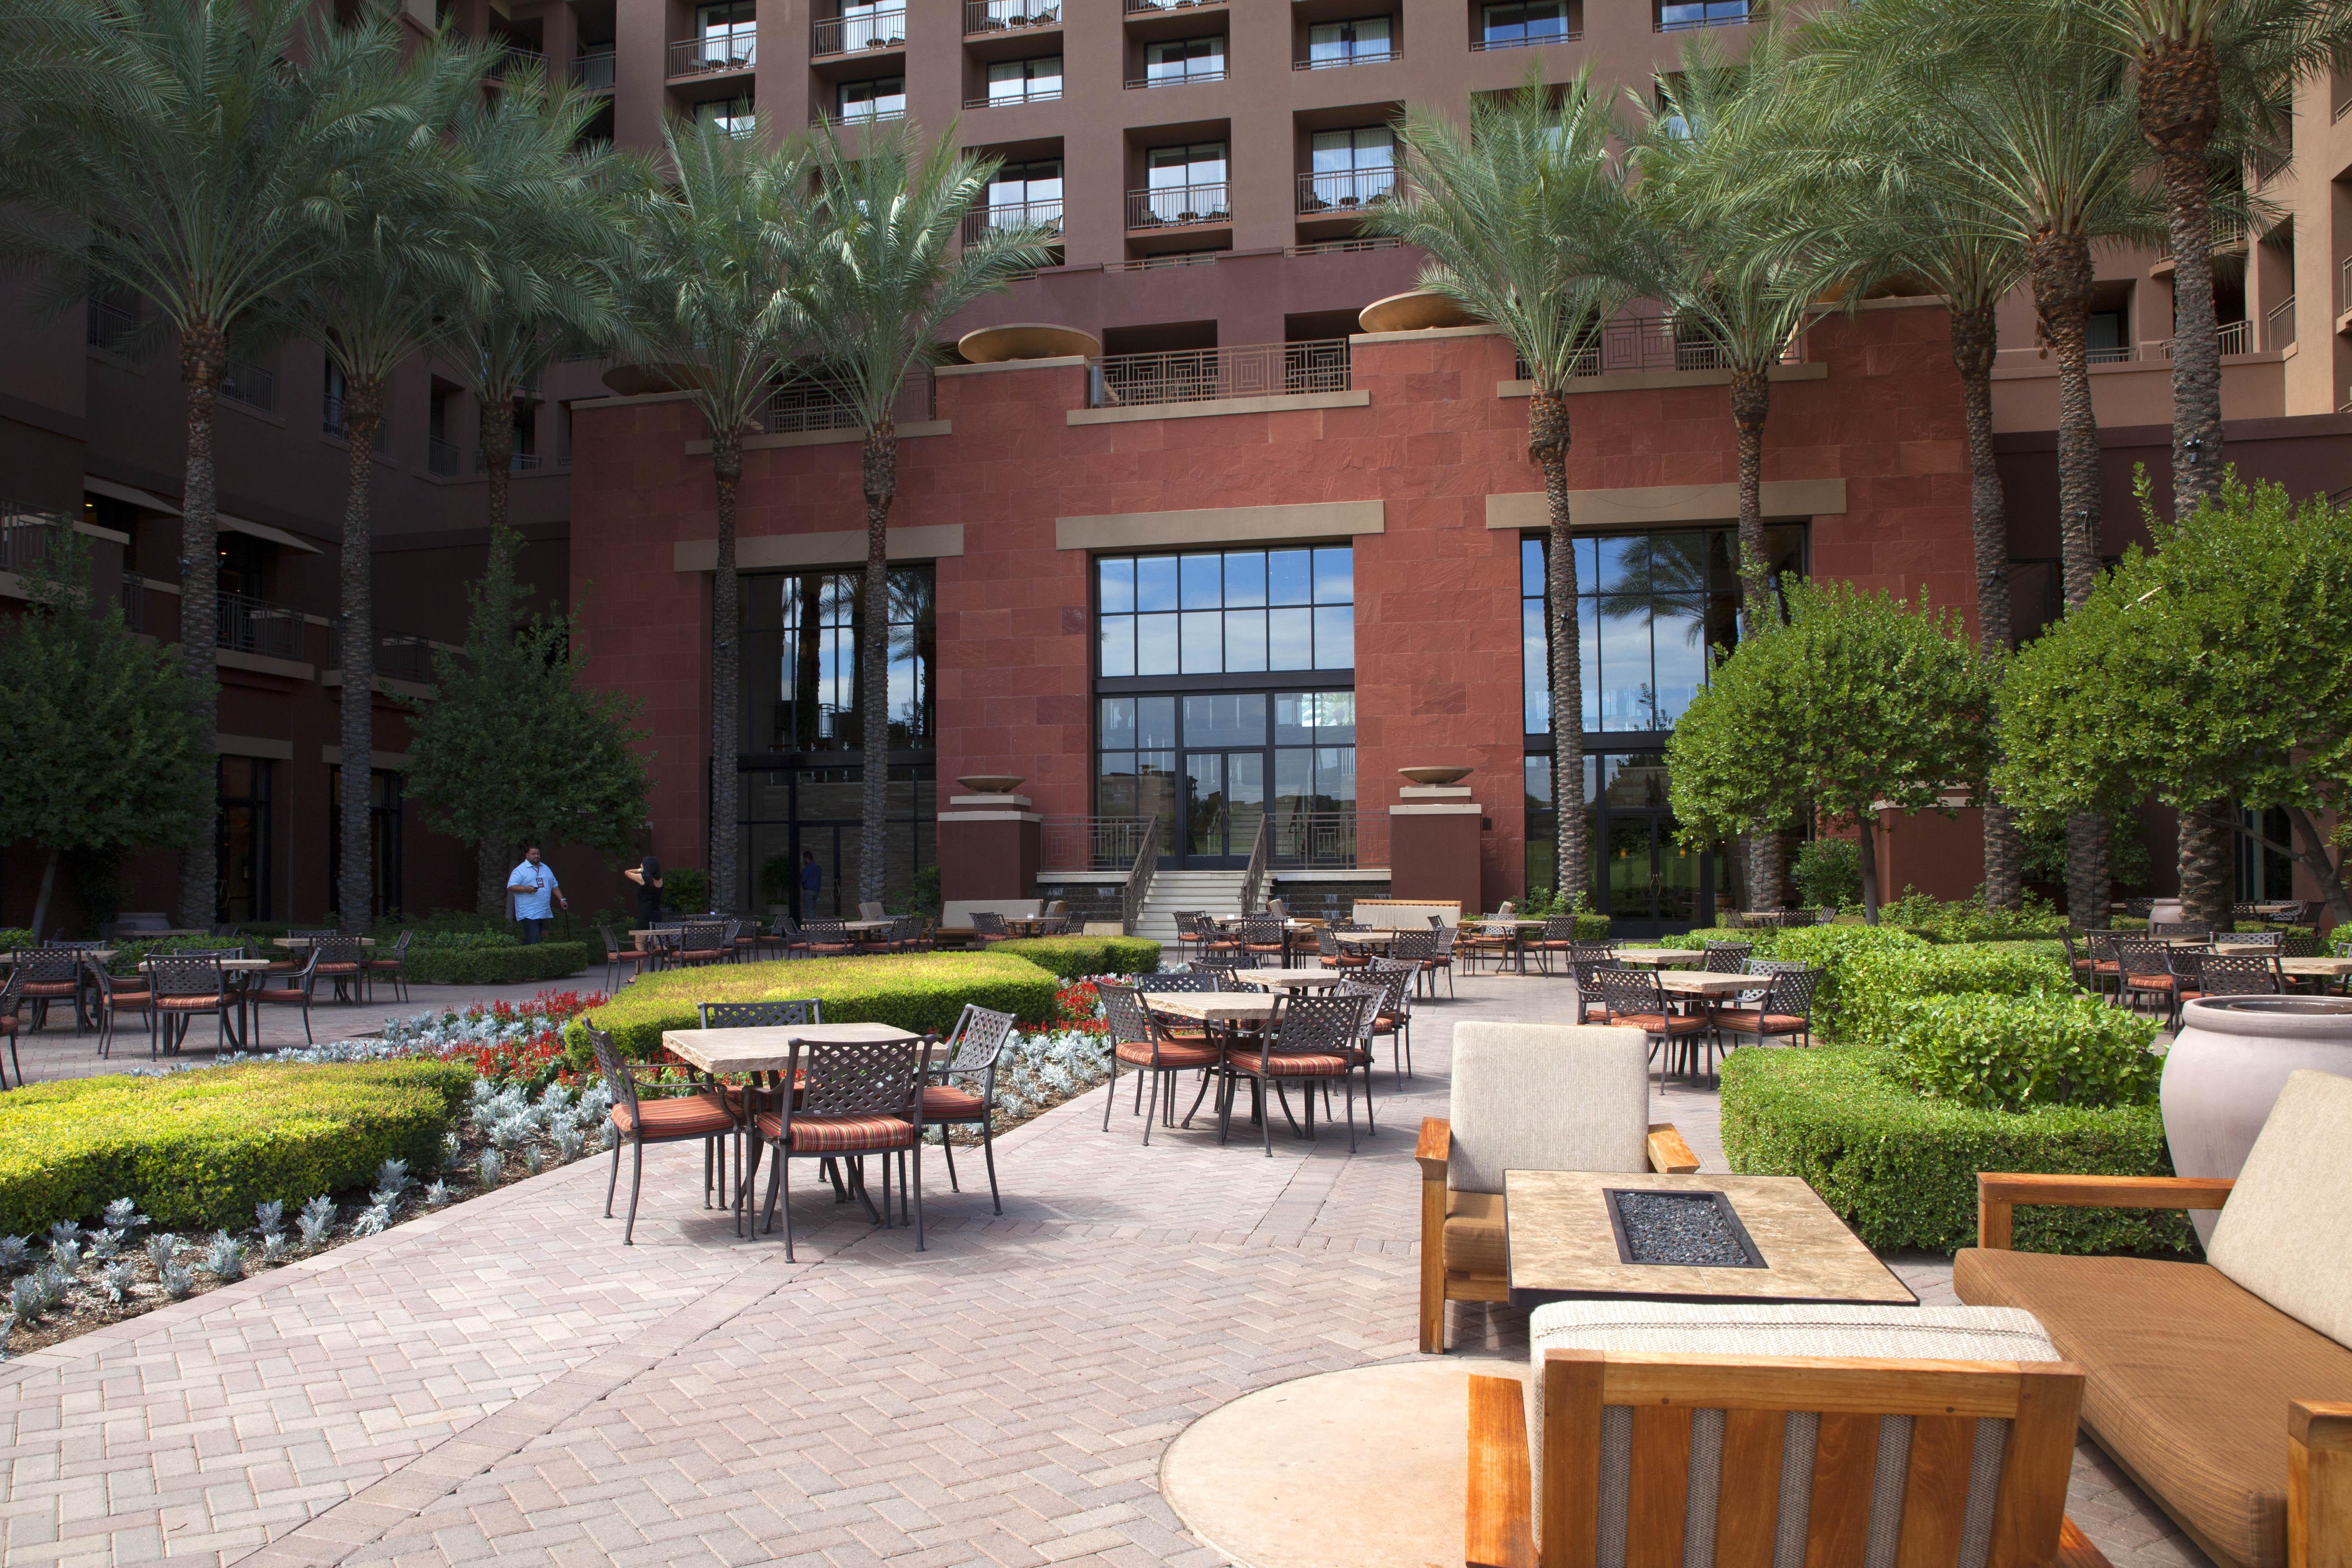 Featured Venue: The Westin Kierland Resort & Spa